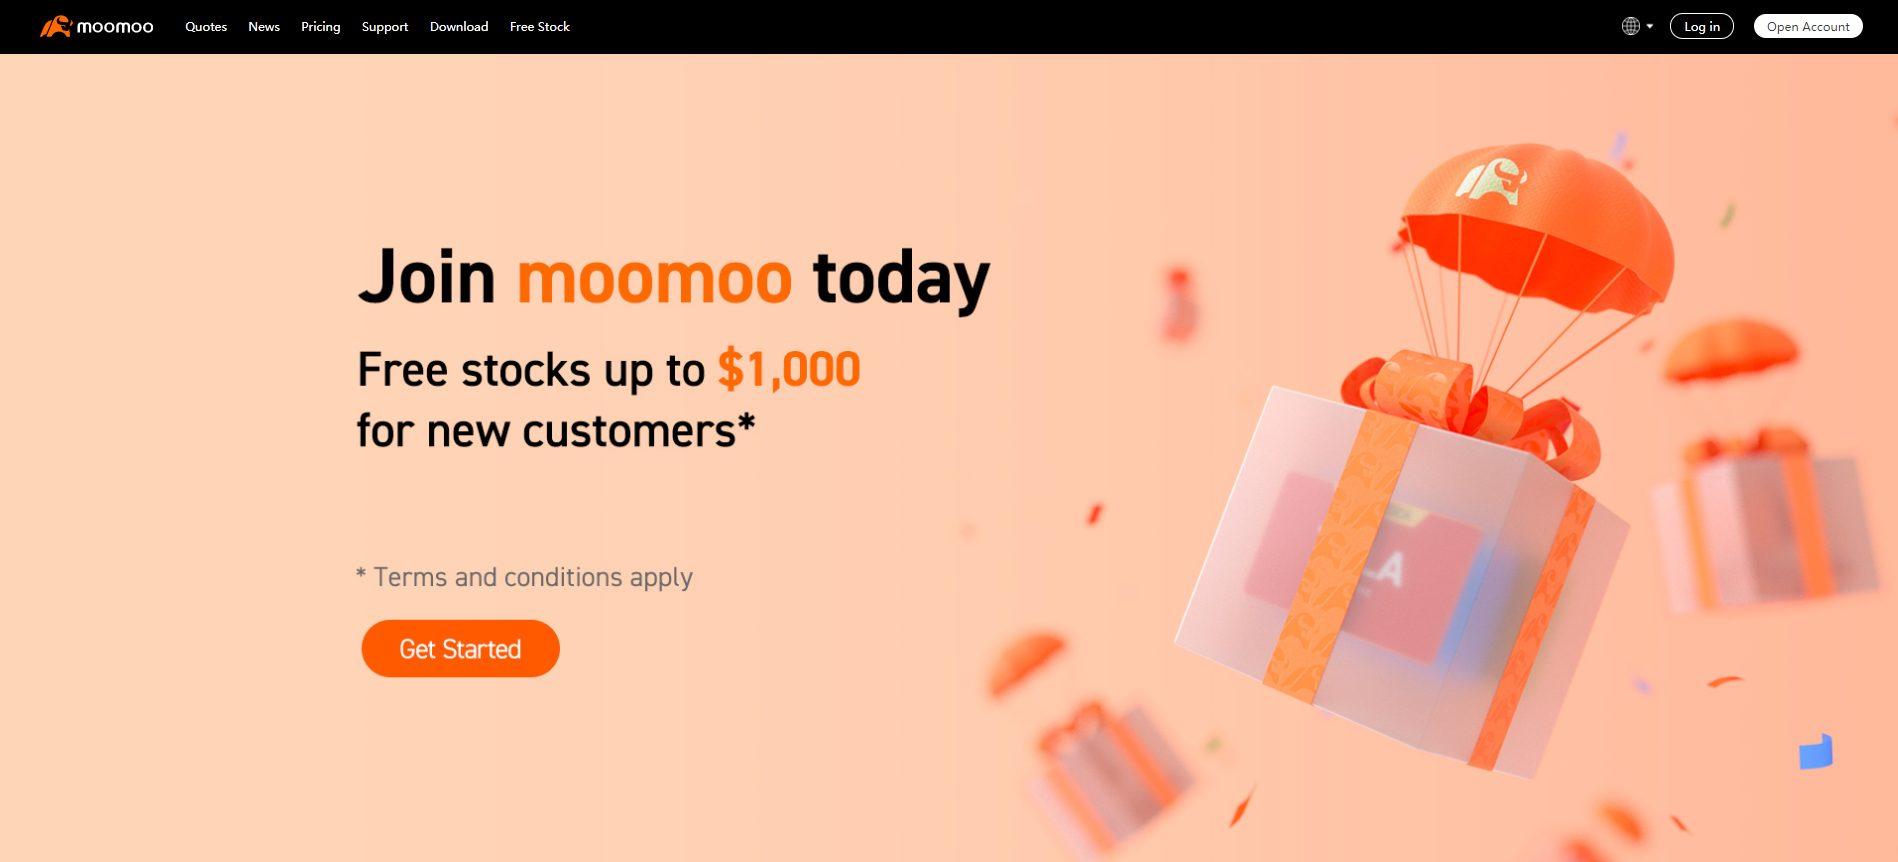 moomoo - robinhood alternatives